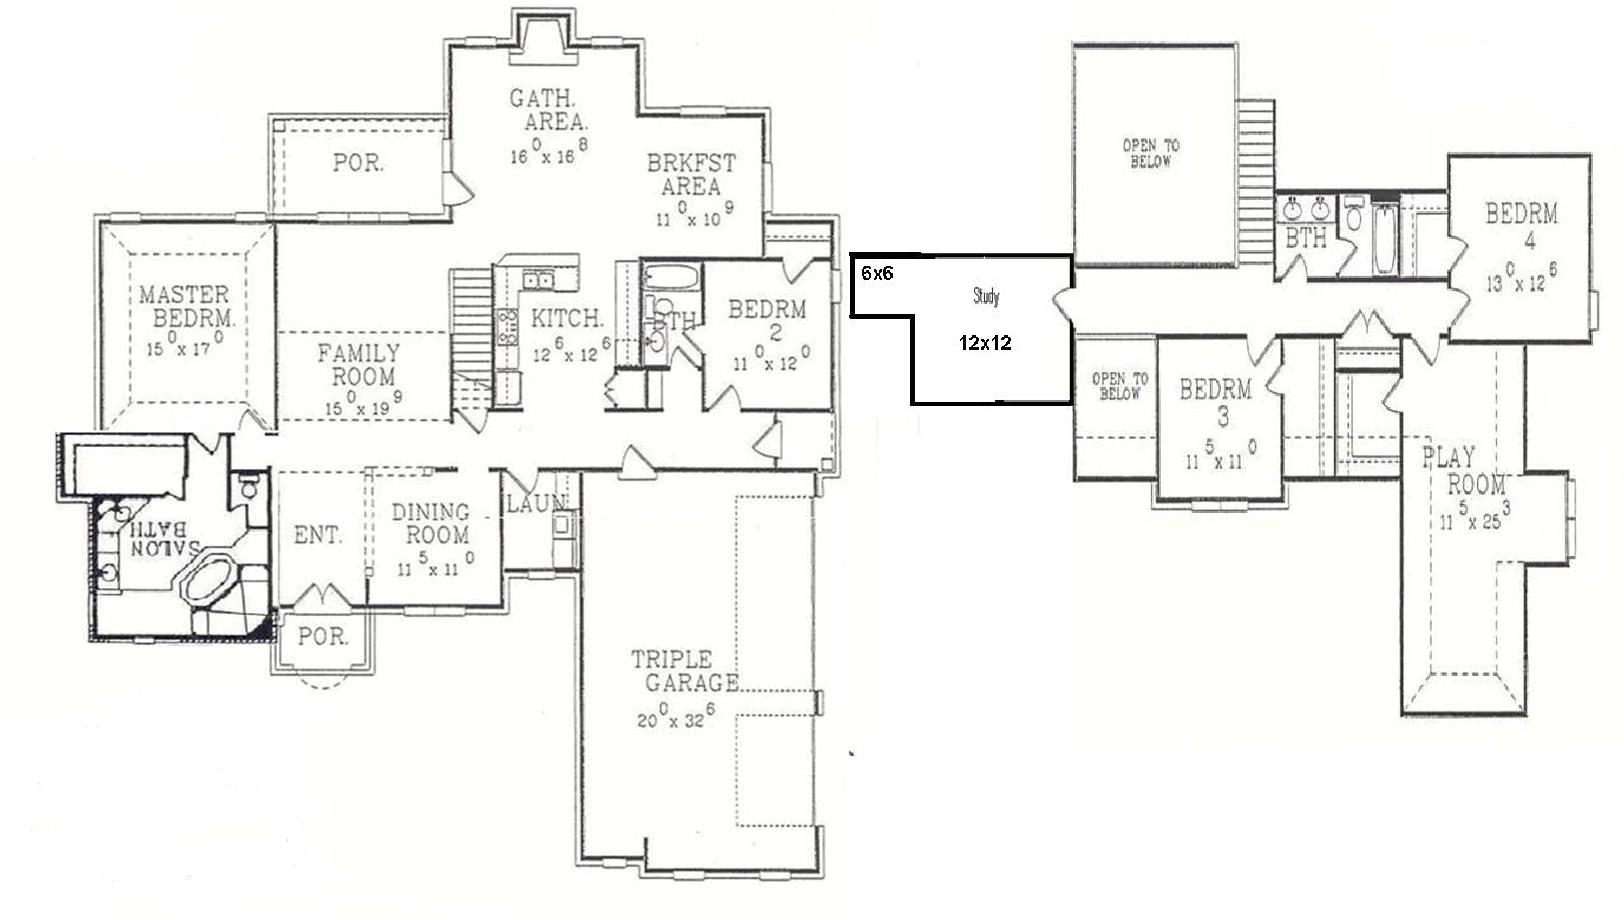 Oakwood Homes Floor Plans Modular 2000 Oakwood Mobile Home Floor Plan Modern Modular Home